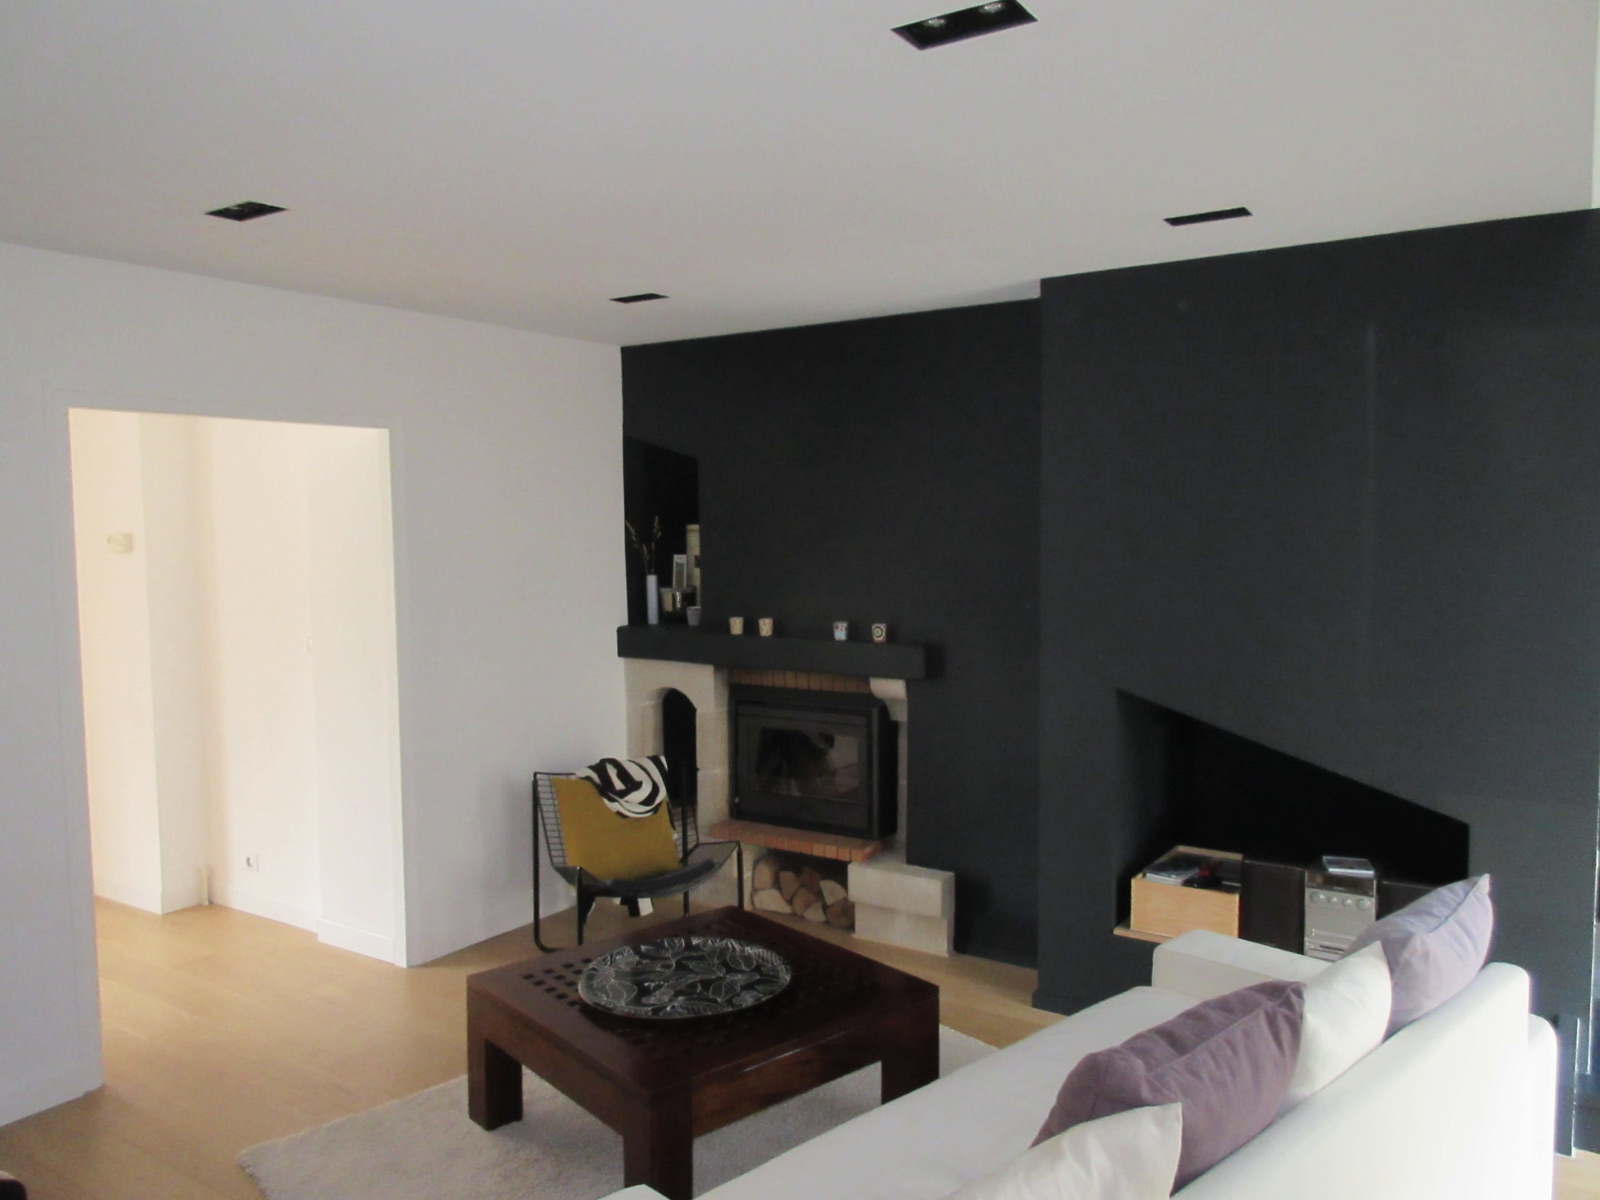 rénovation-intérieure-custhome